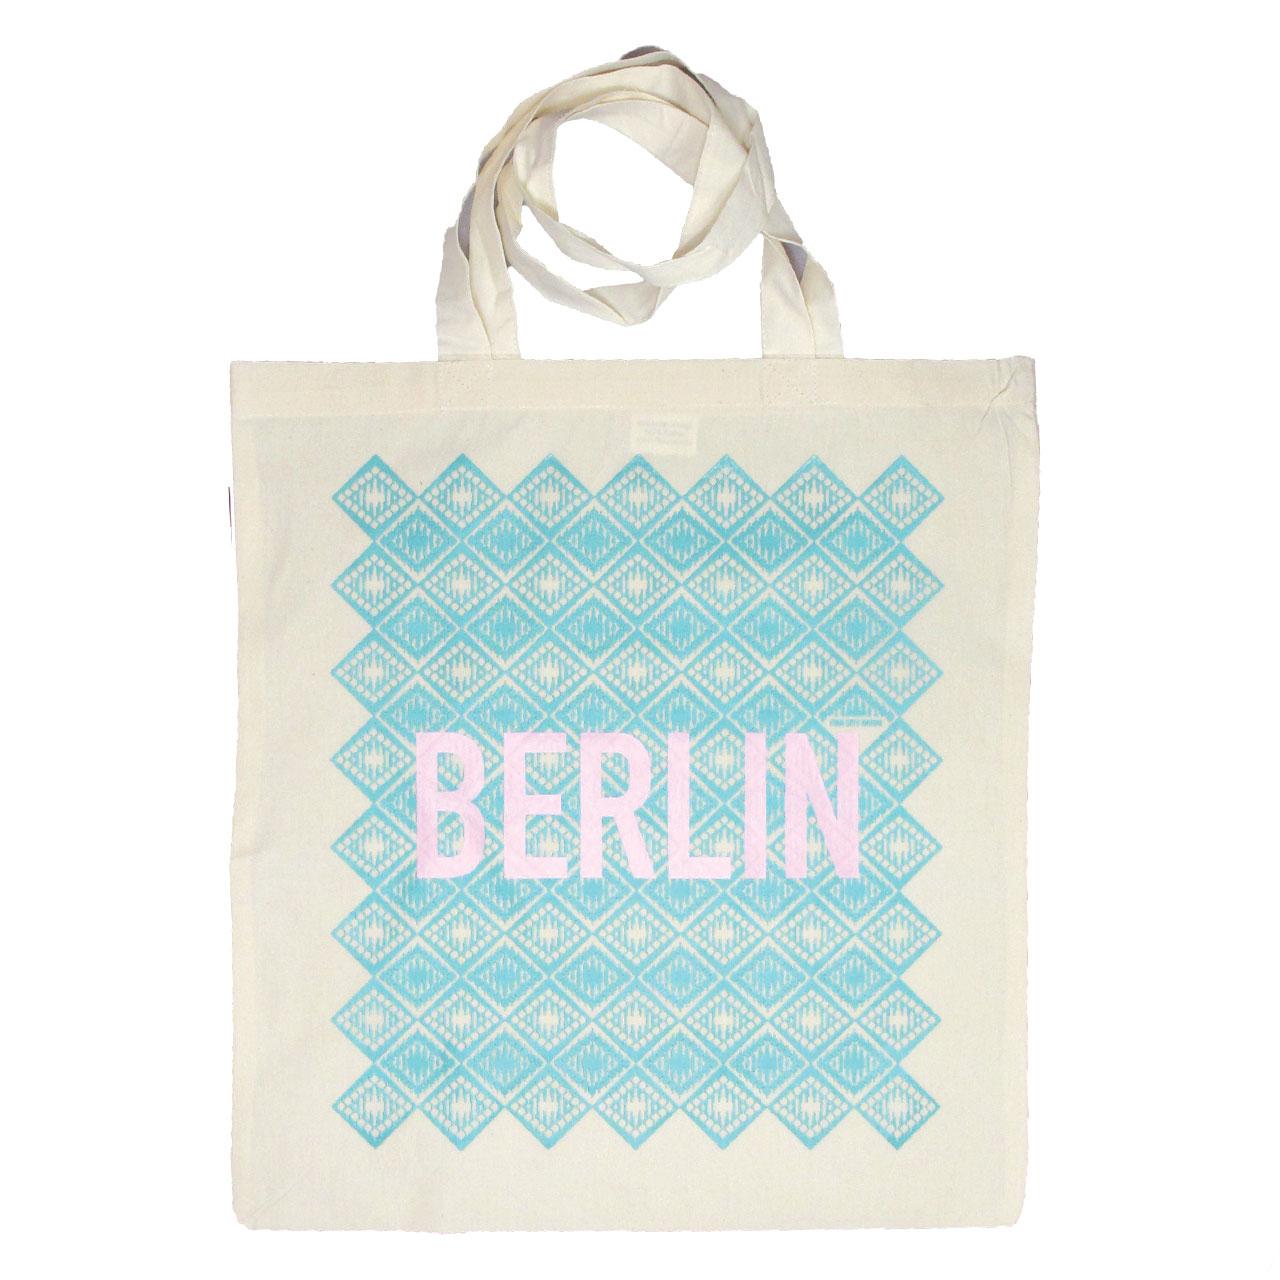 Berlin Jutebeutel Fernsehturm mint/lila